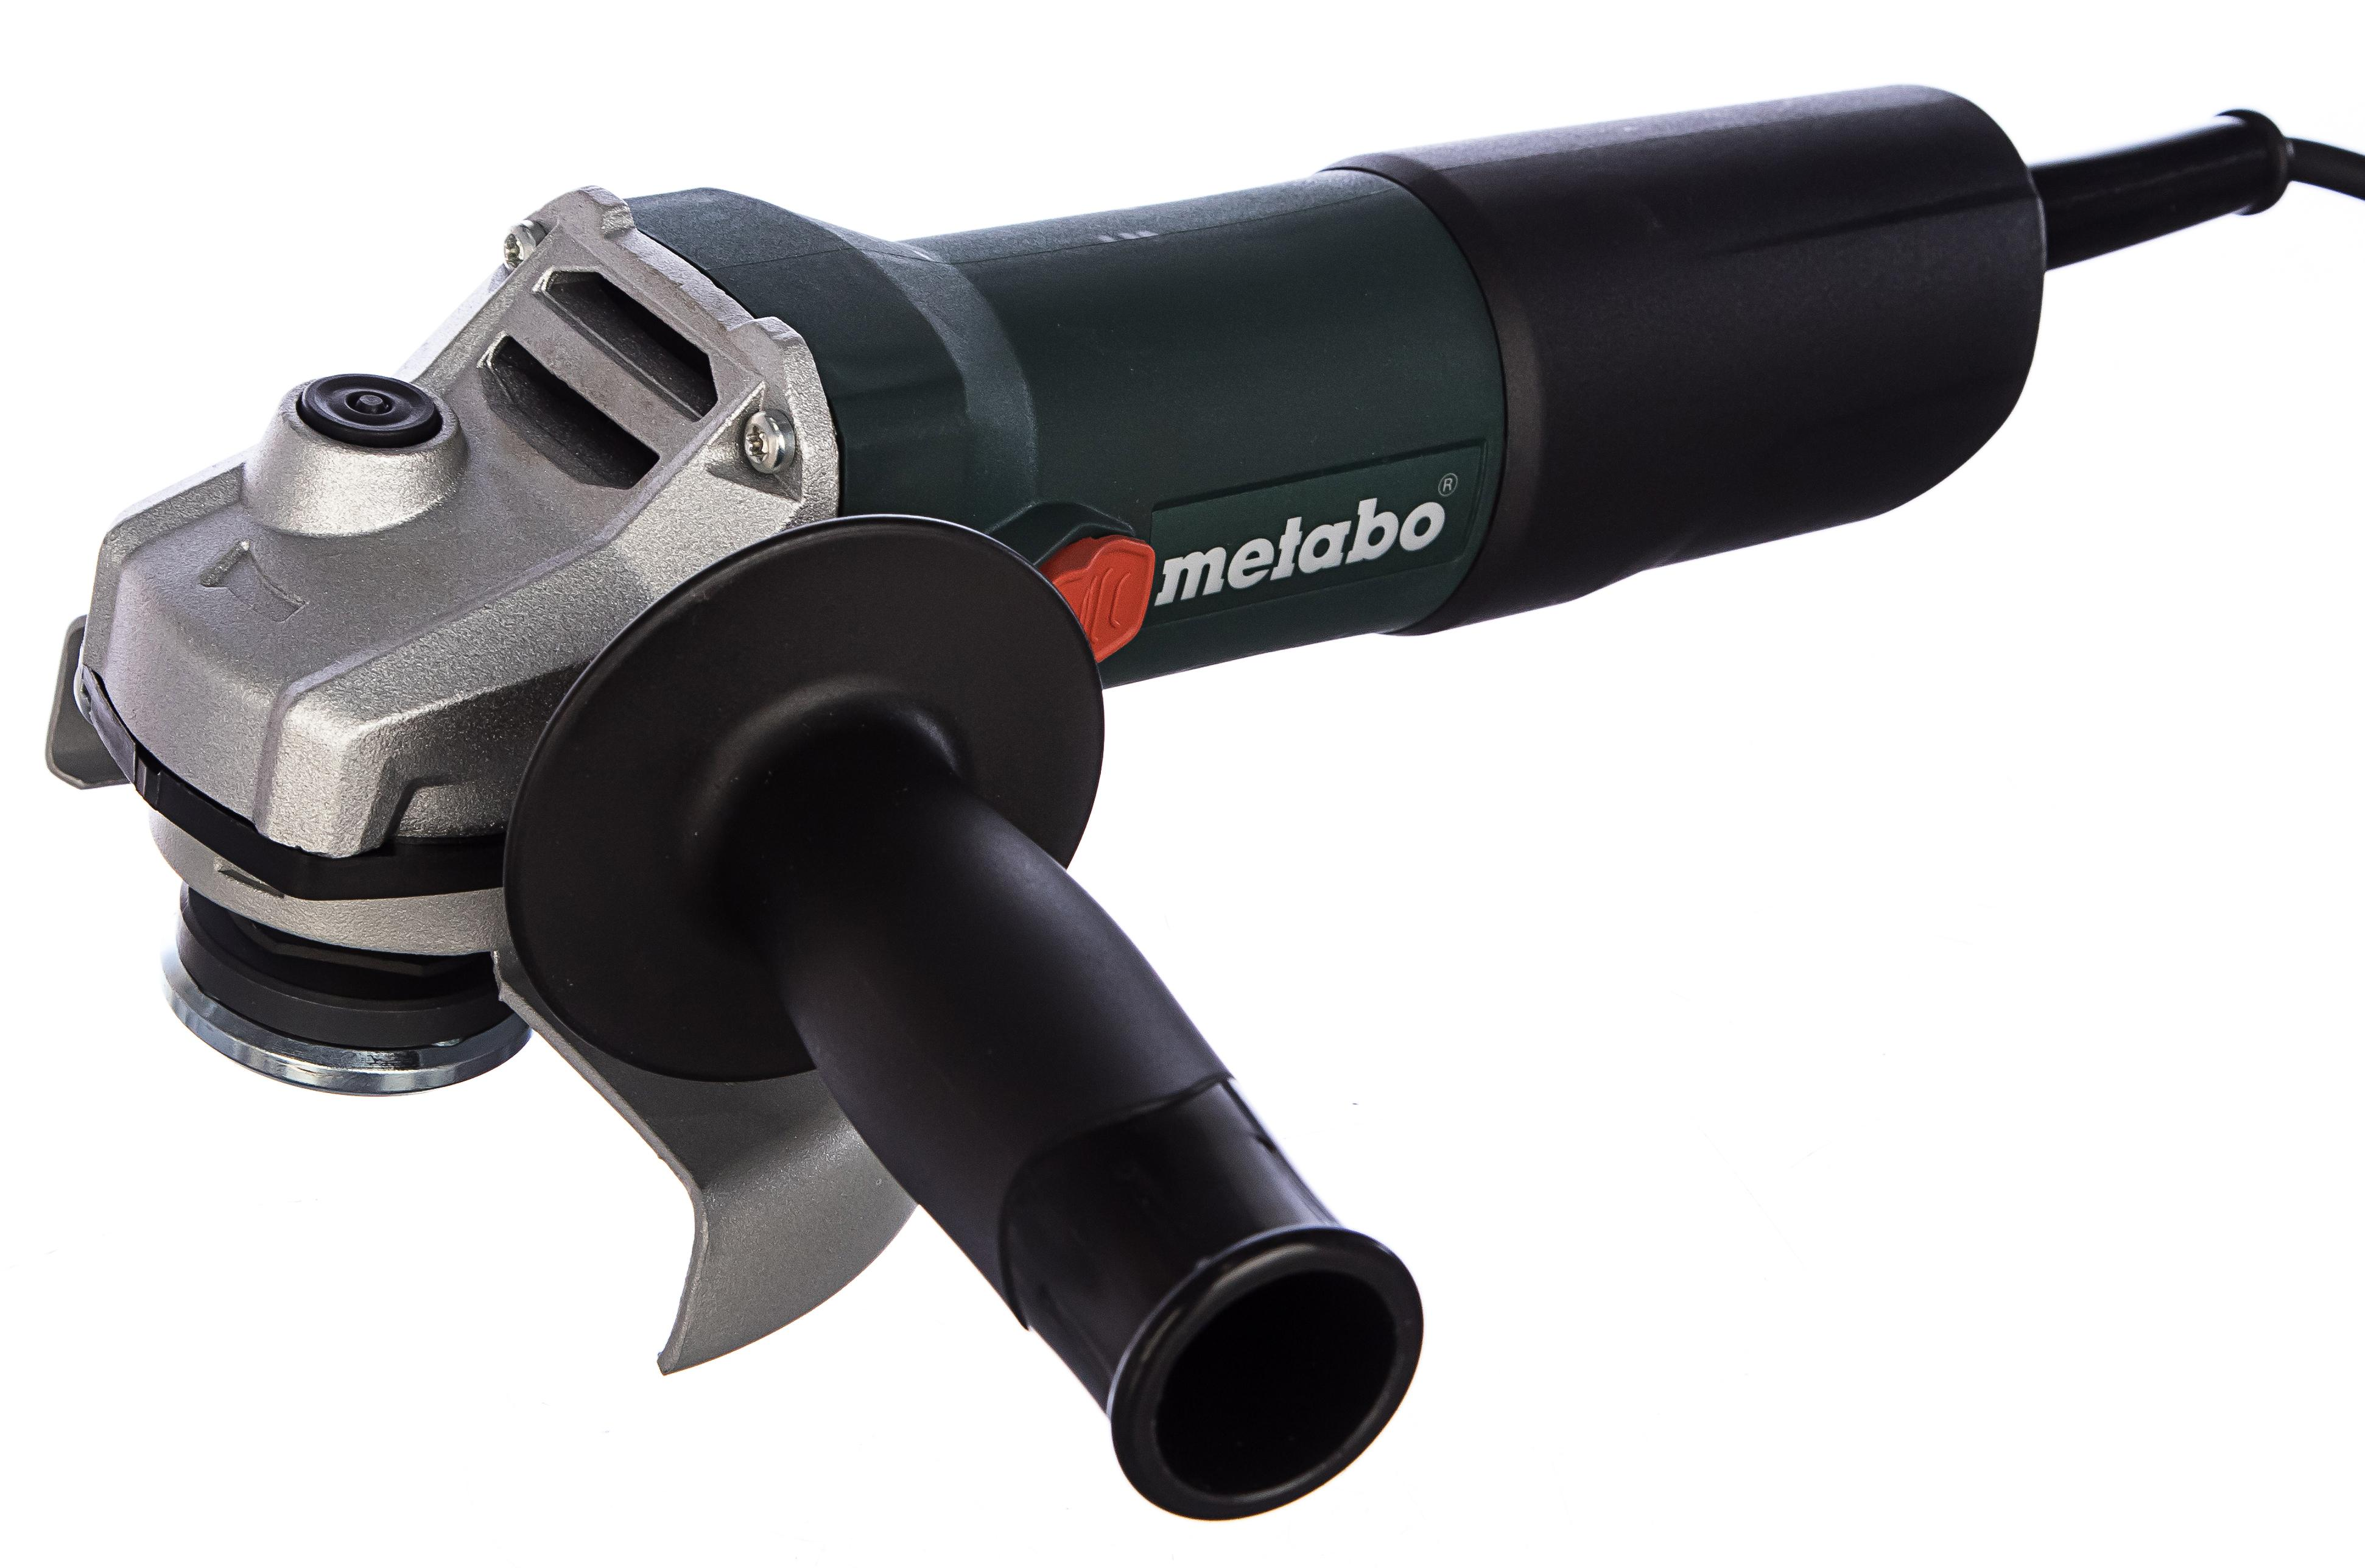 Фото - УШМ (болгарка) Metabo W850-125 603608010 набор metabo ушм болгарка w 9 125 600376010 лента ремонтная 240 001